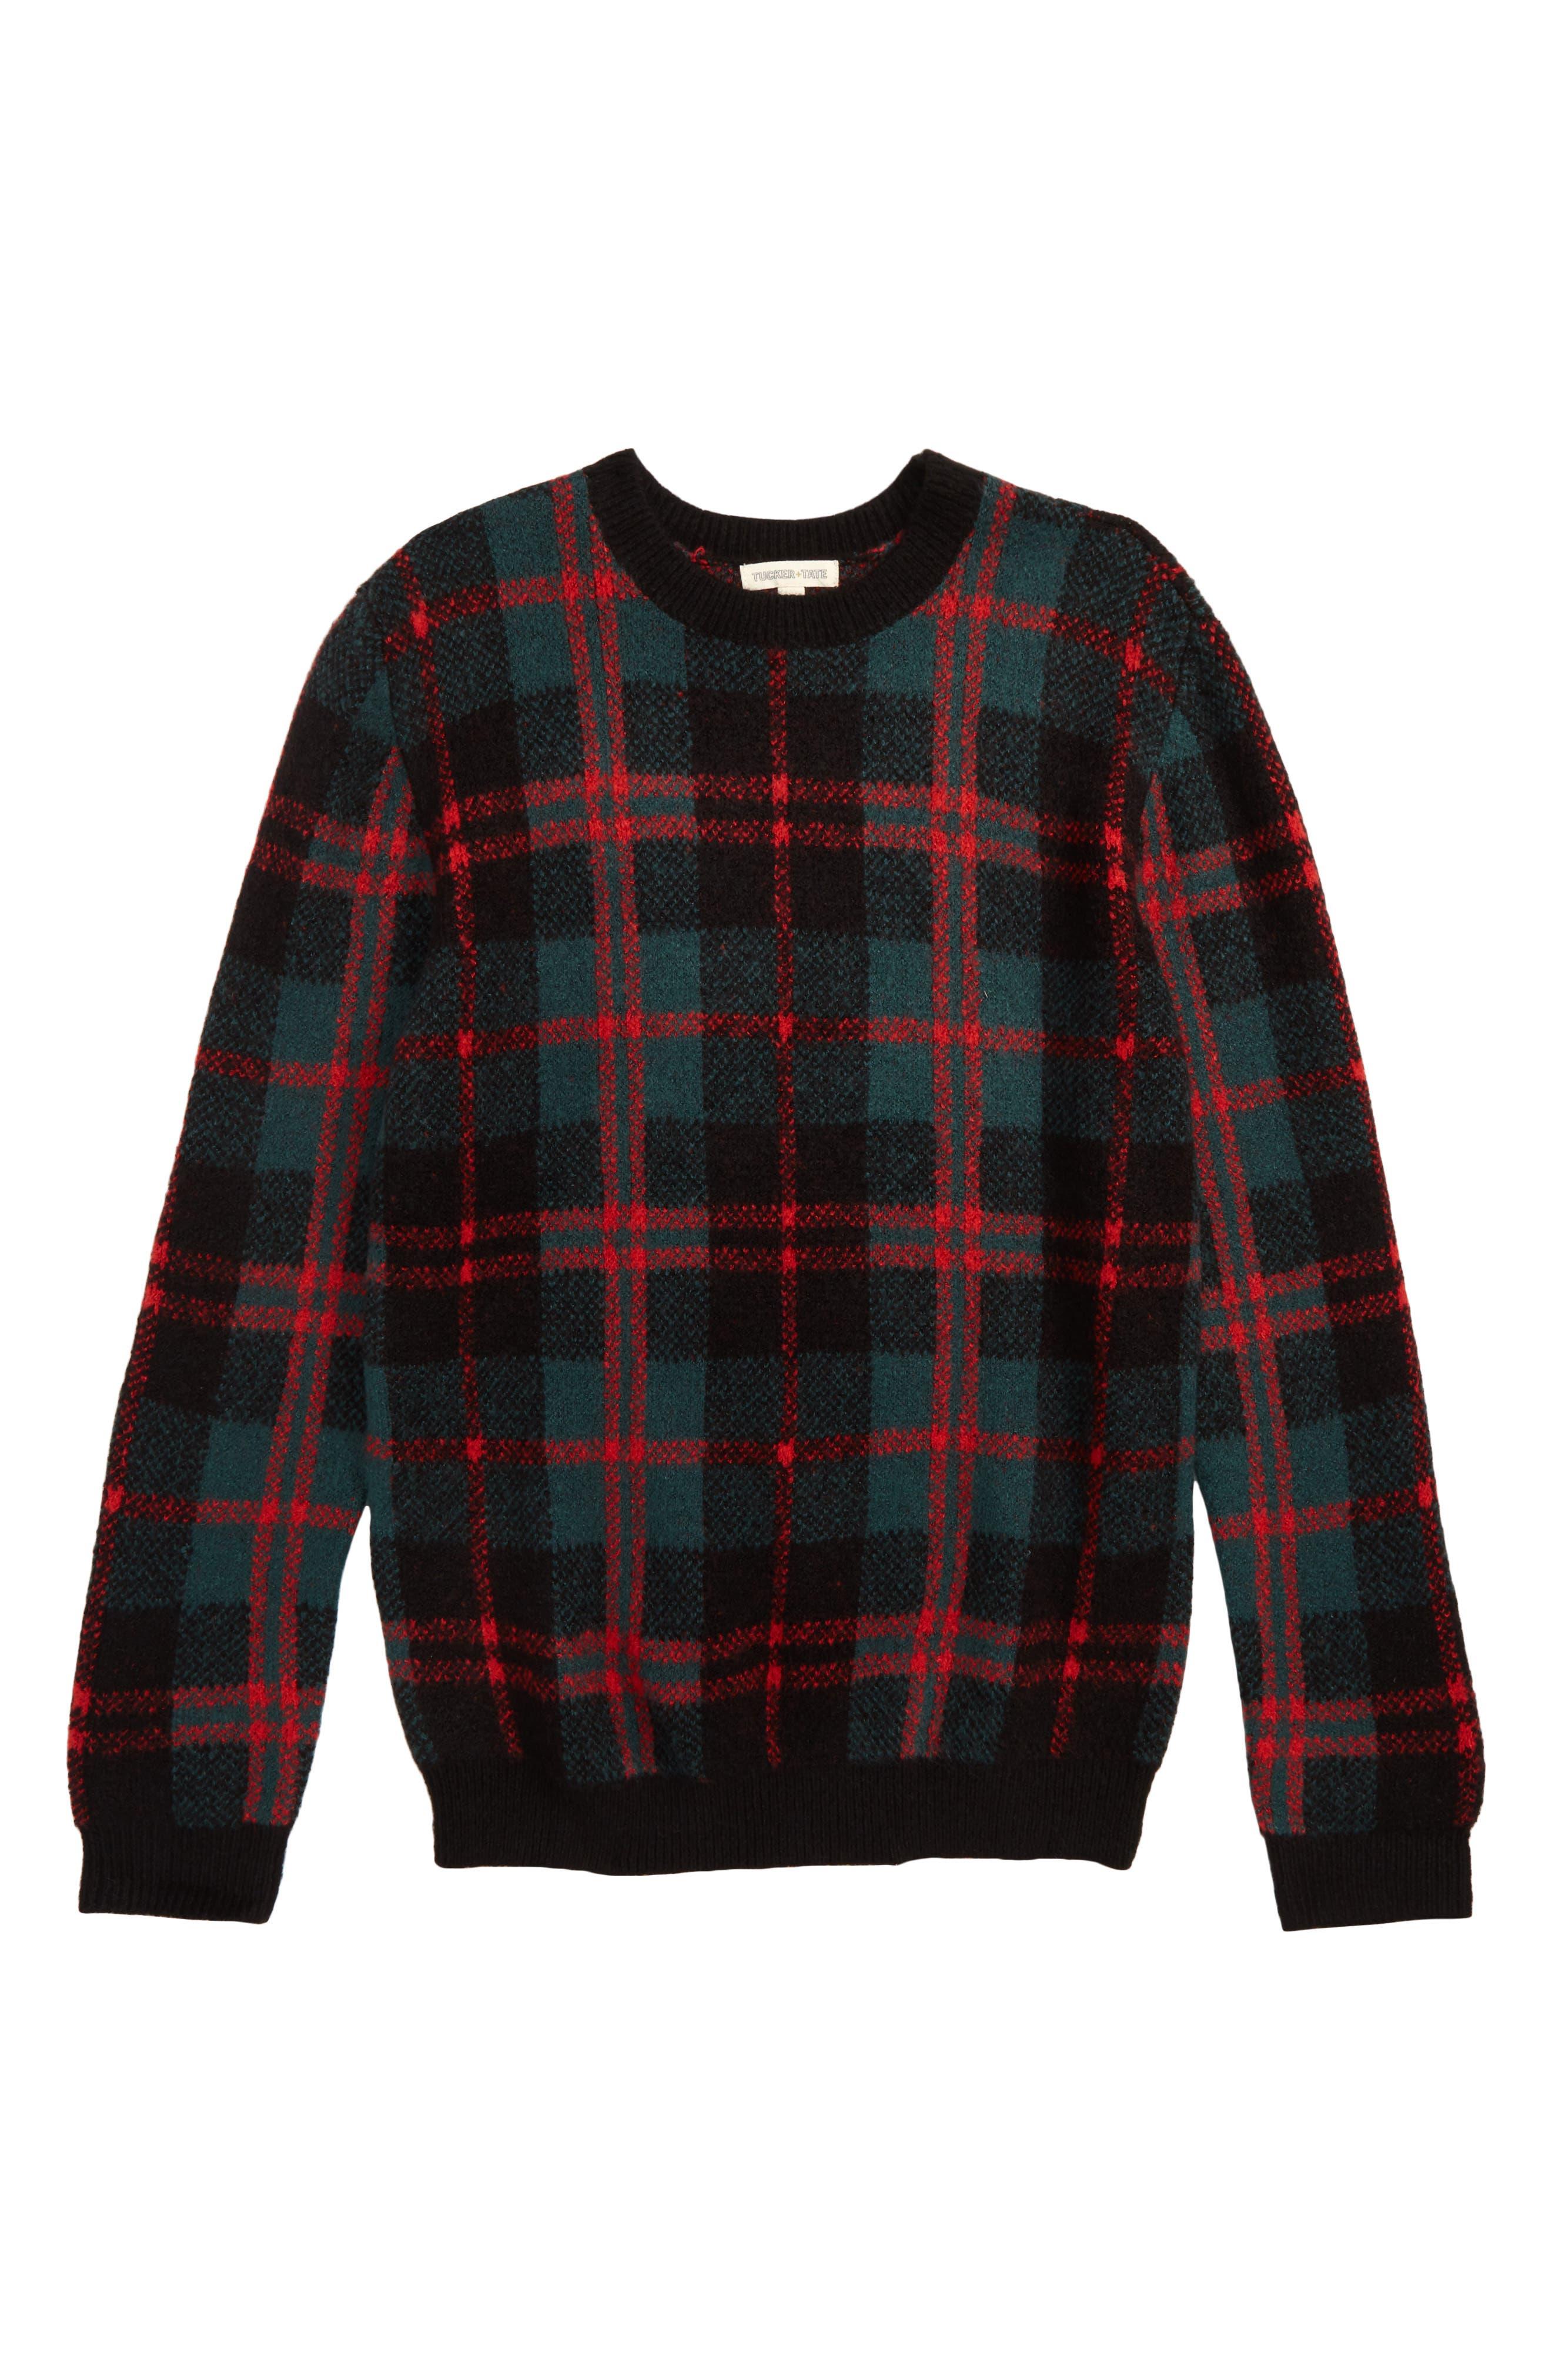 Tartan Plaid Sweater,                             Main thumbnail 1, color,                             GREEN BUG WINDOWPANE PLAID